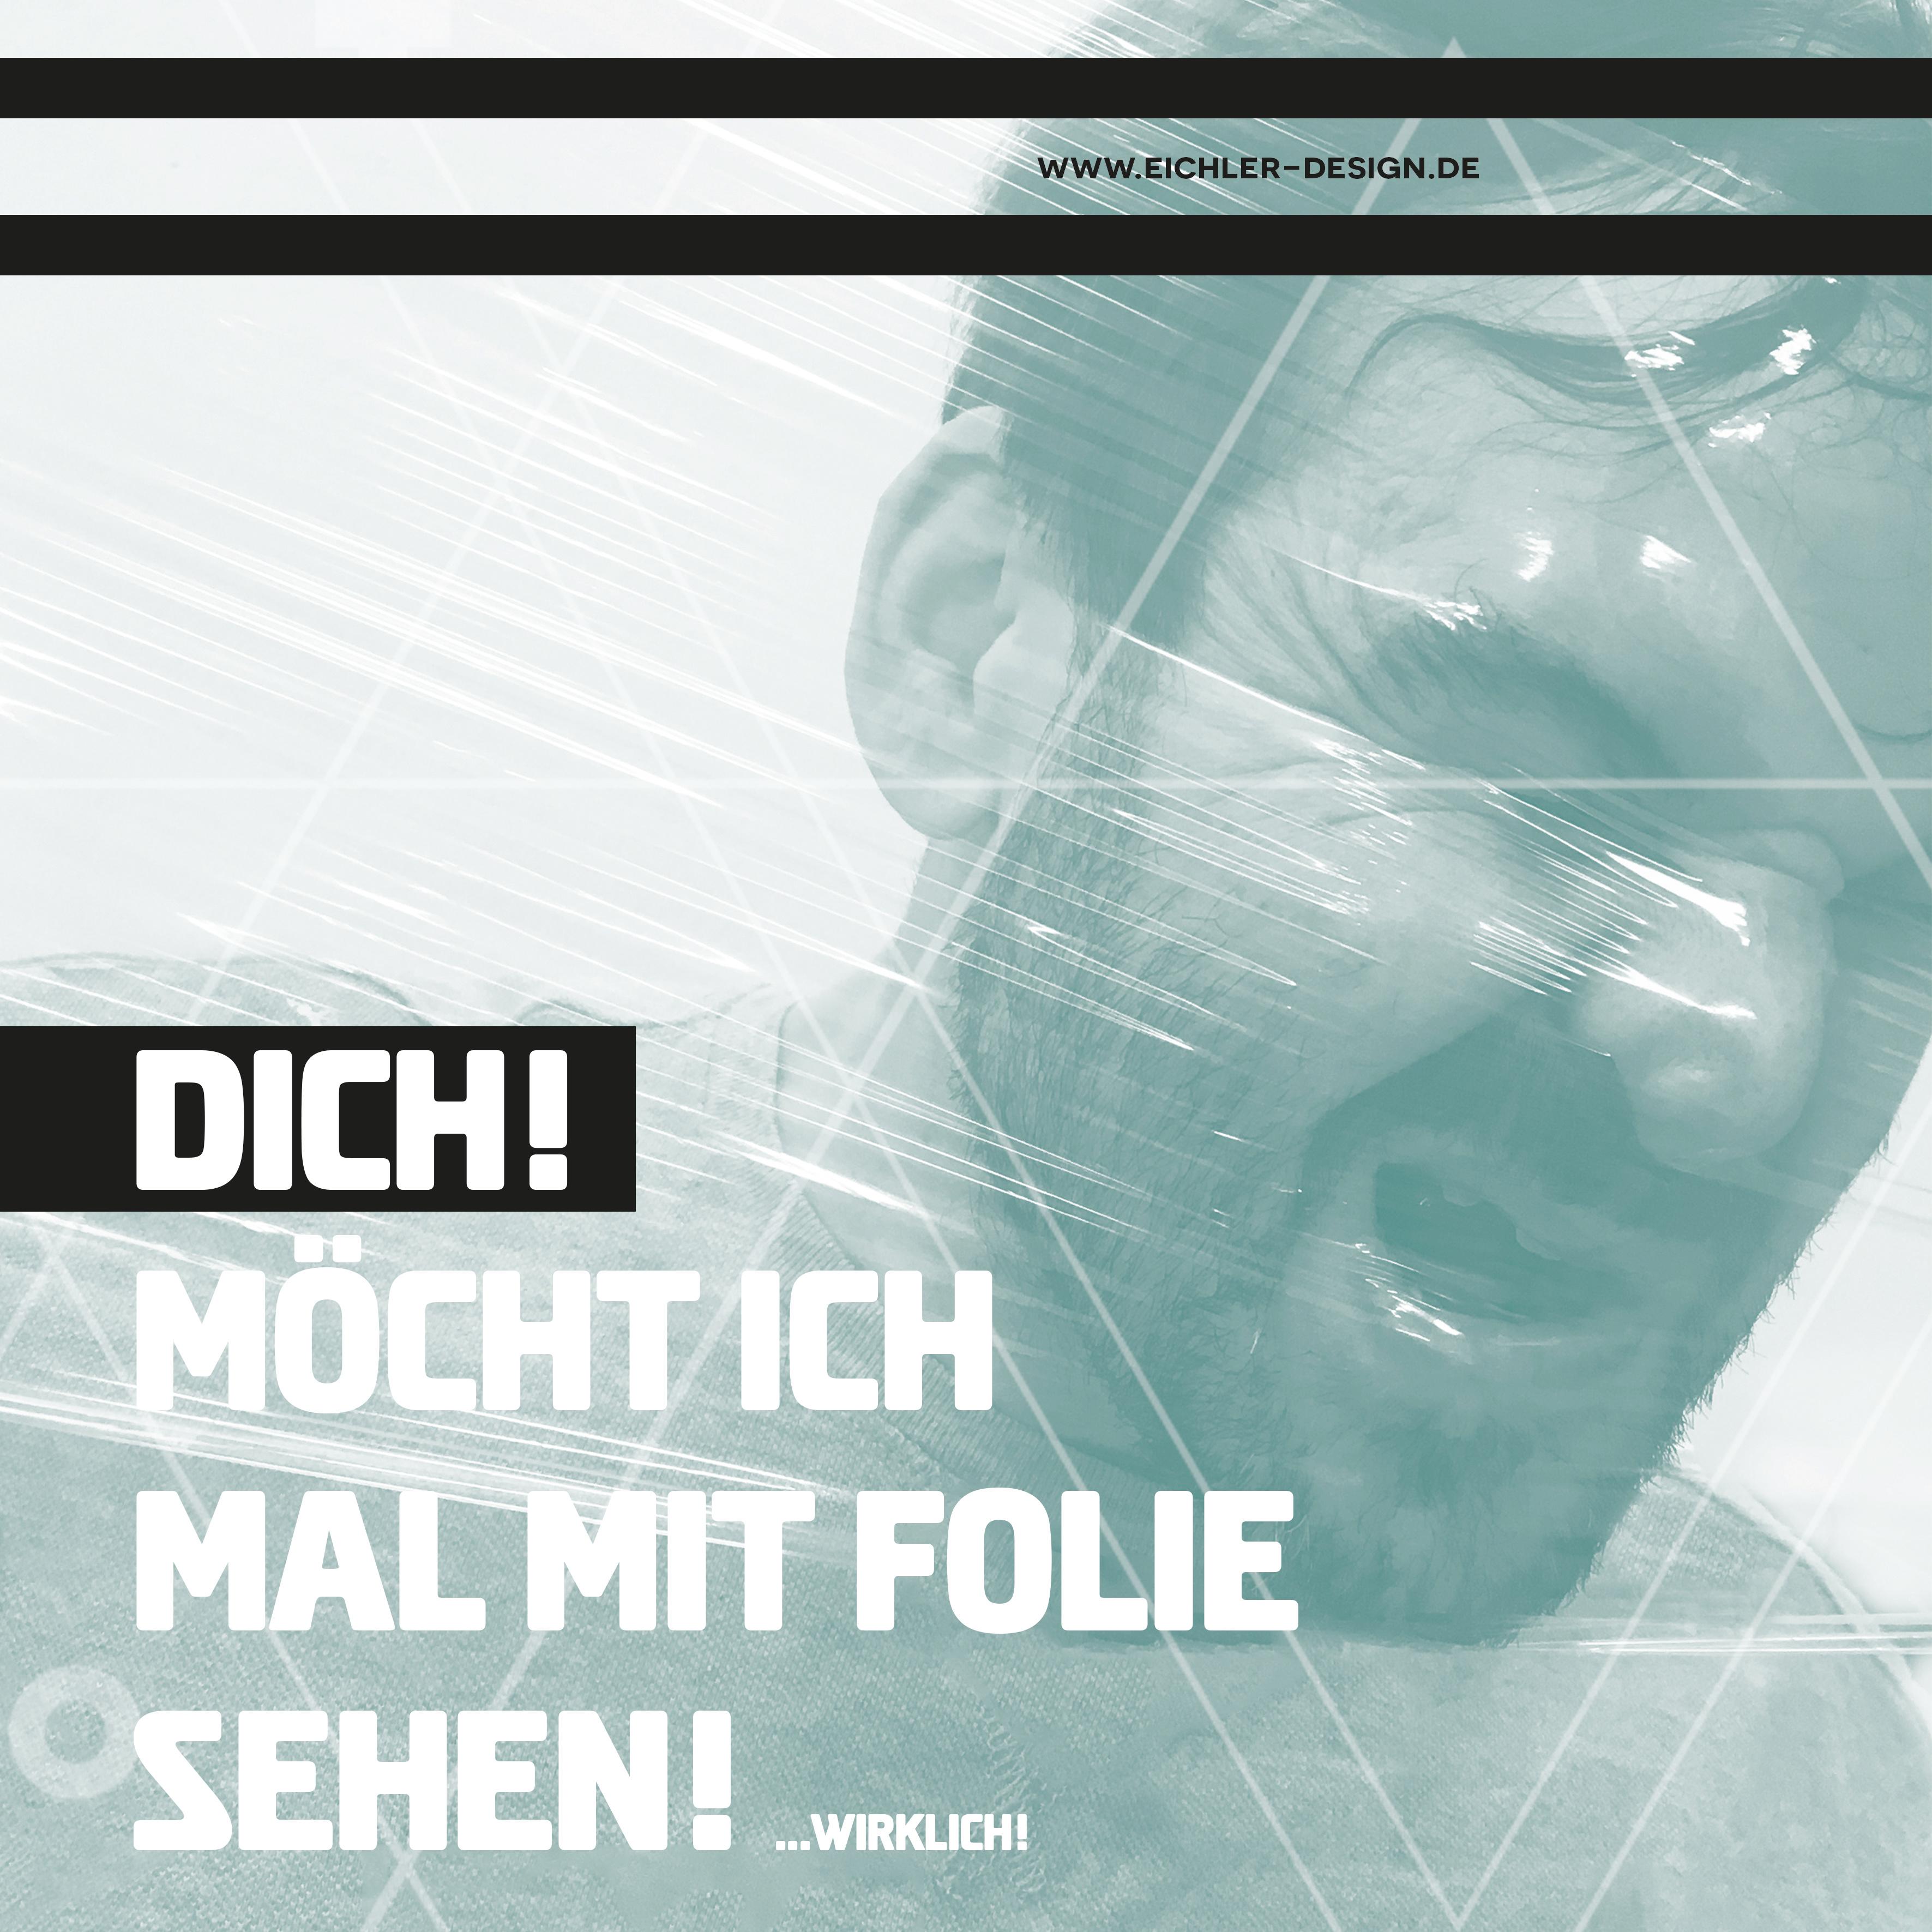 Logo, Werbung, Agentur, Riesa, Eichl